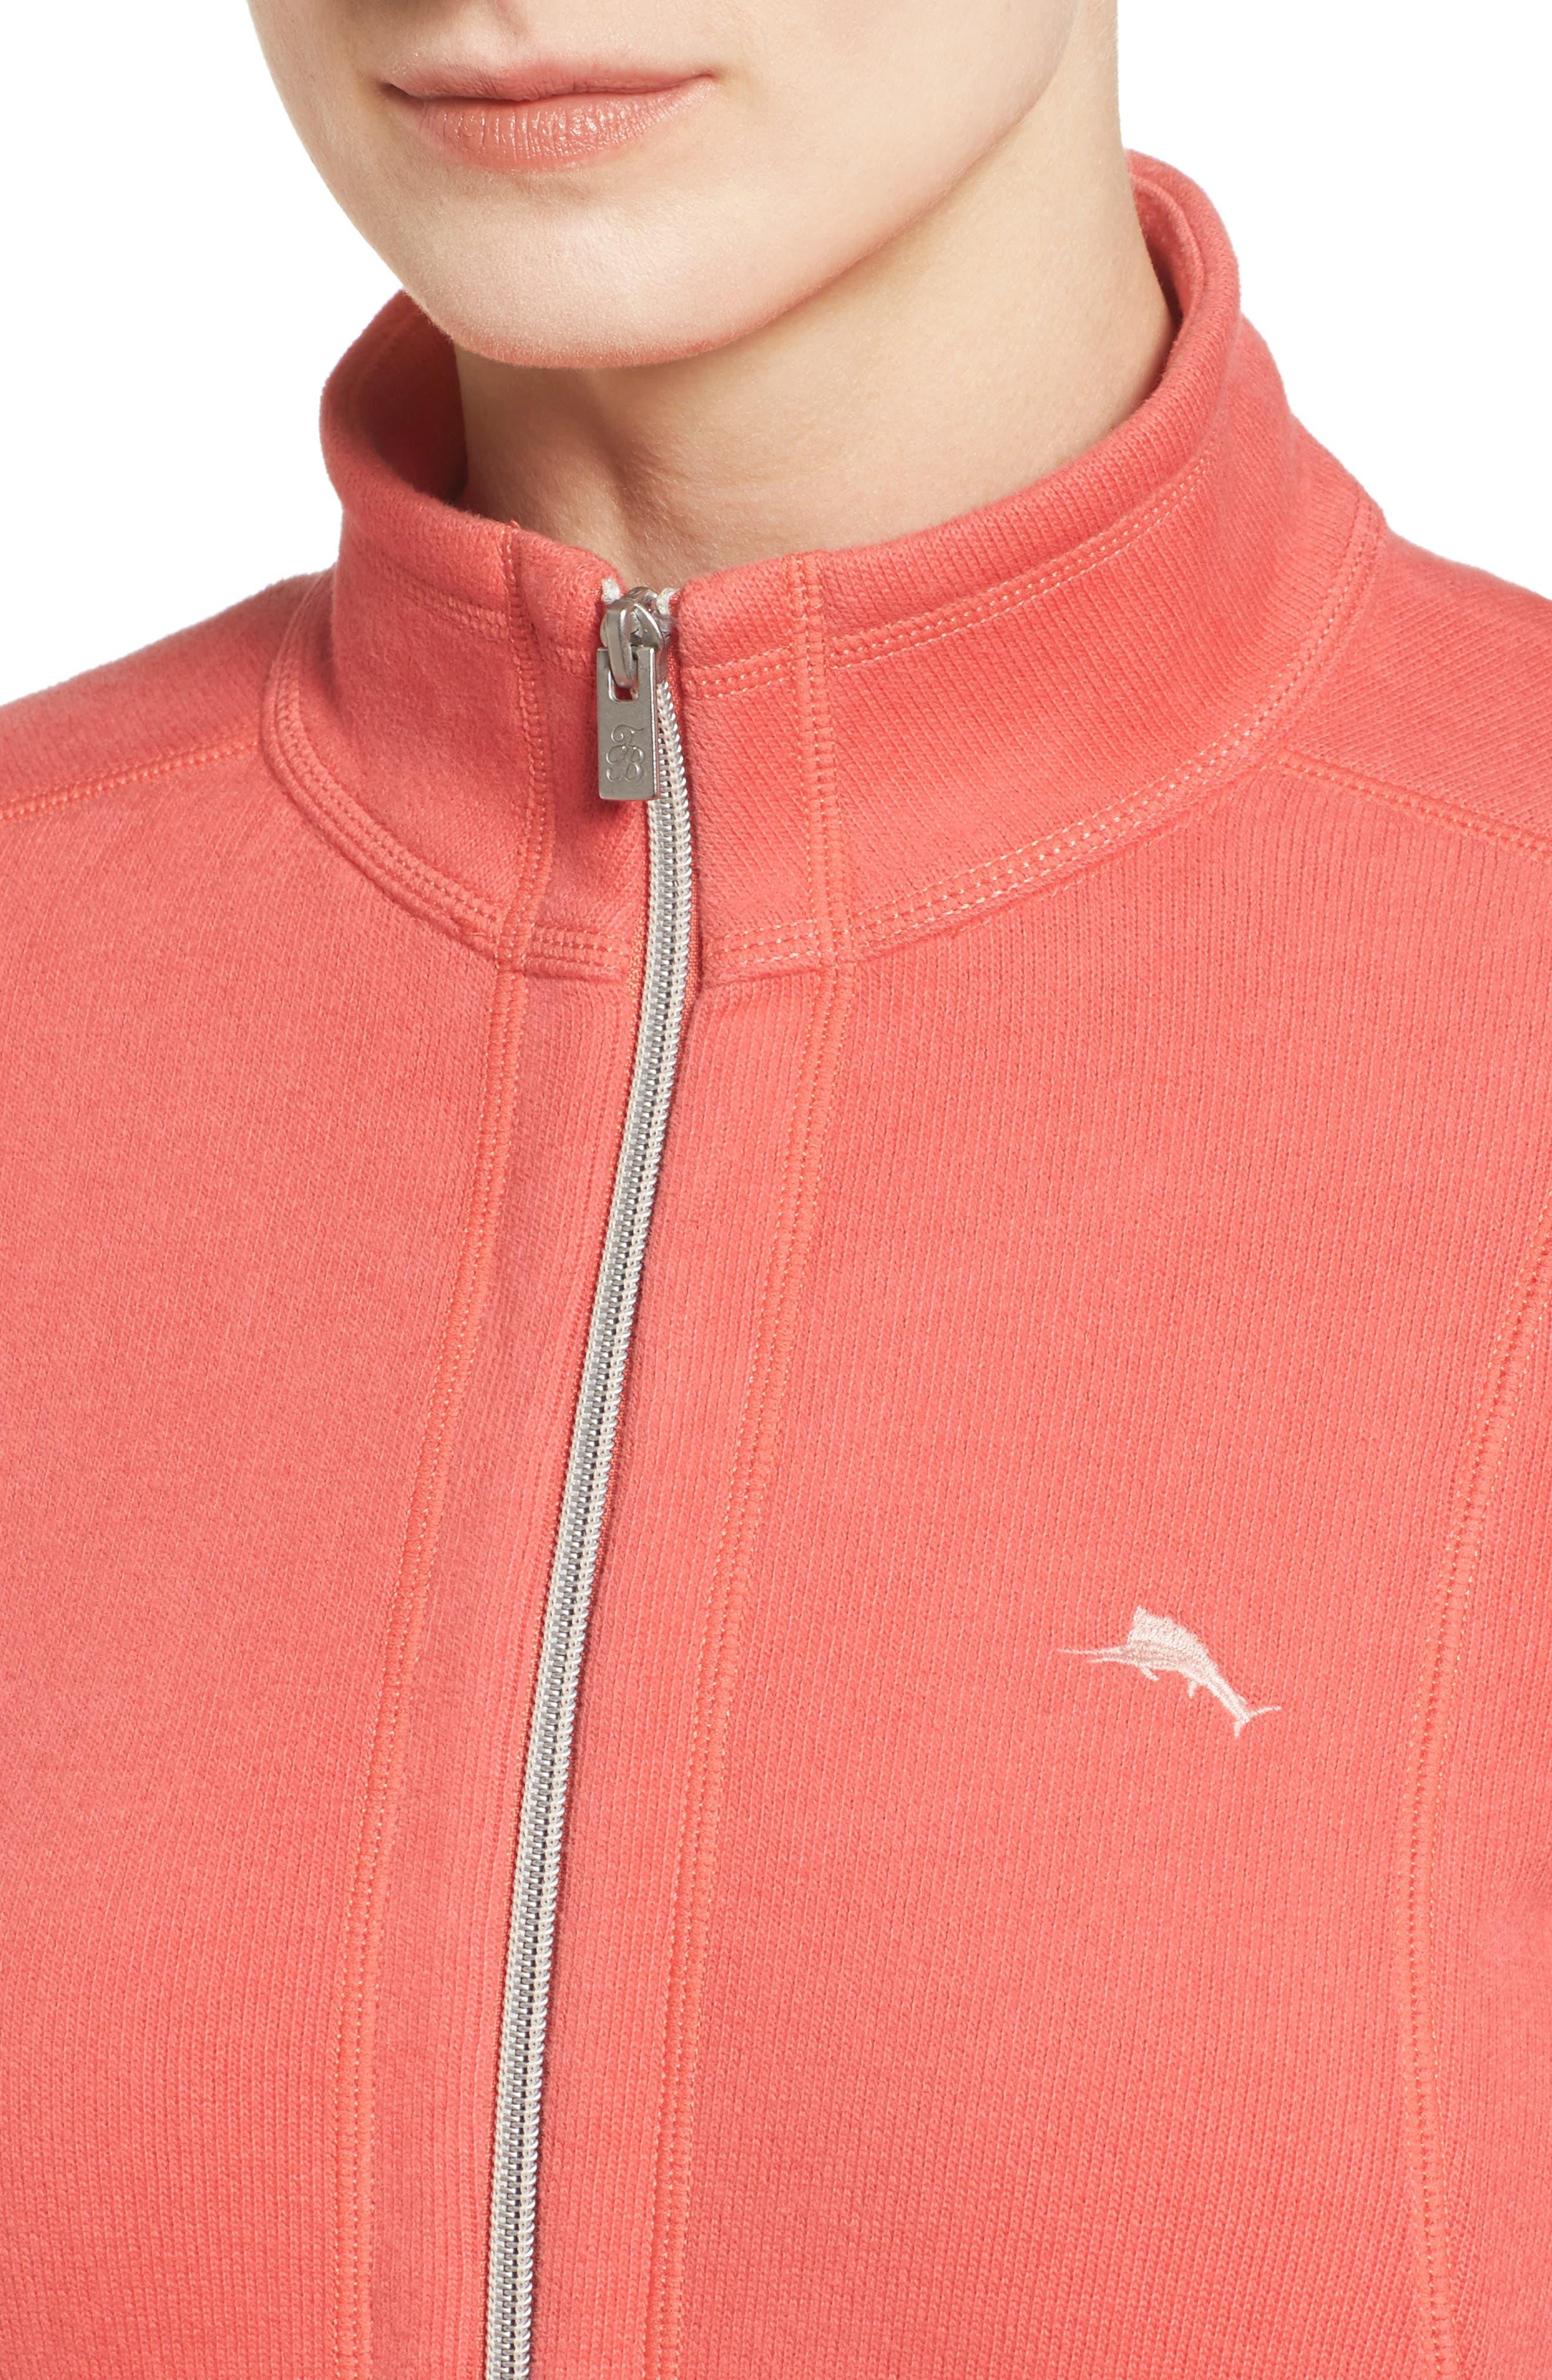 'Aruba' Full Zip Sweatshirt,                             Alternate thumbnail 32, color,